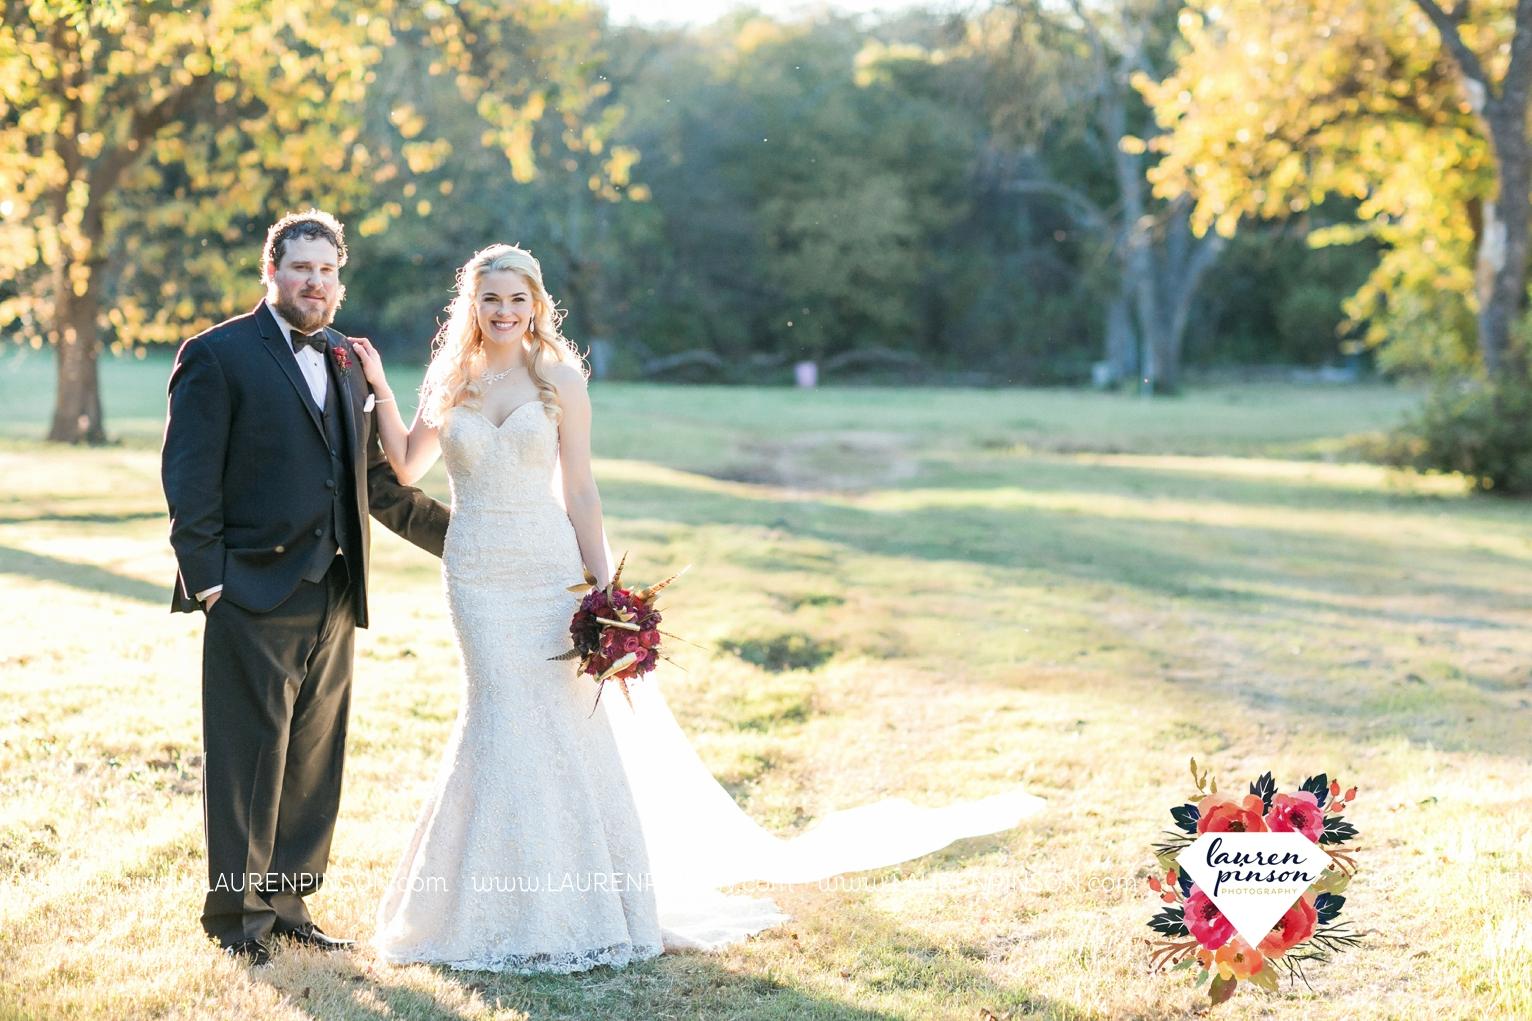 rustic-wichita-falls-texas-wedding-photographer-gold-glam-mayfield-events-market-street-united-allue-bridals-fall_1765.jpg